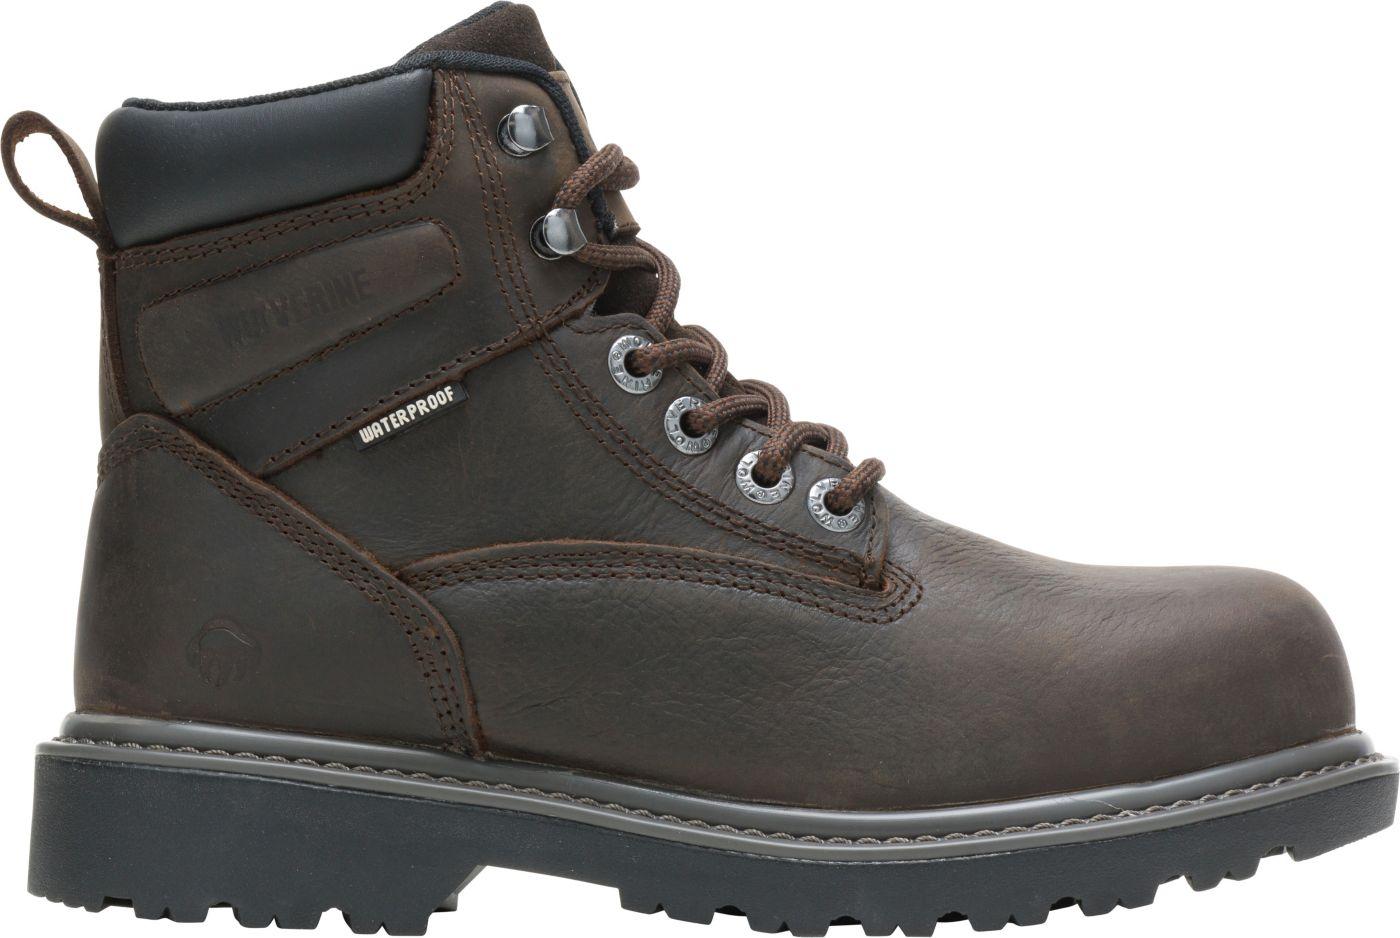 Wolverine Women's Floorhand 6'' Waterproof Steel Toe Work Boots